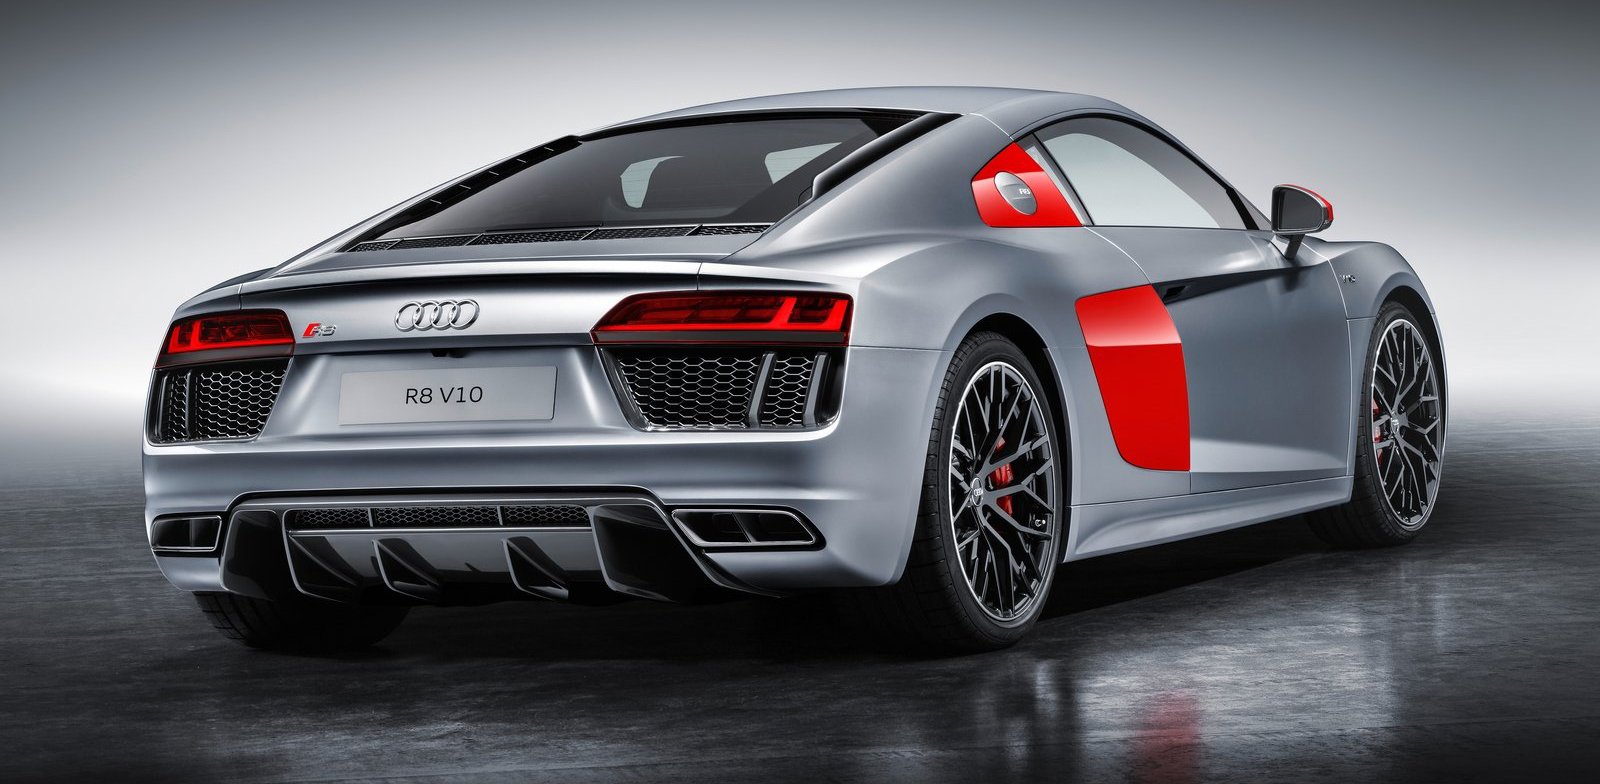 限量推出,audi R8 Coupe Sport Edition 全球发售200辆! Audi R8 Coupe